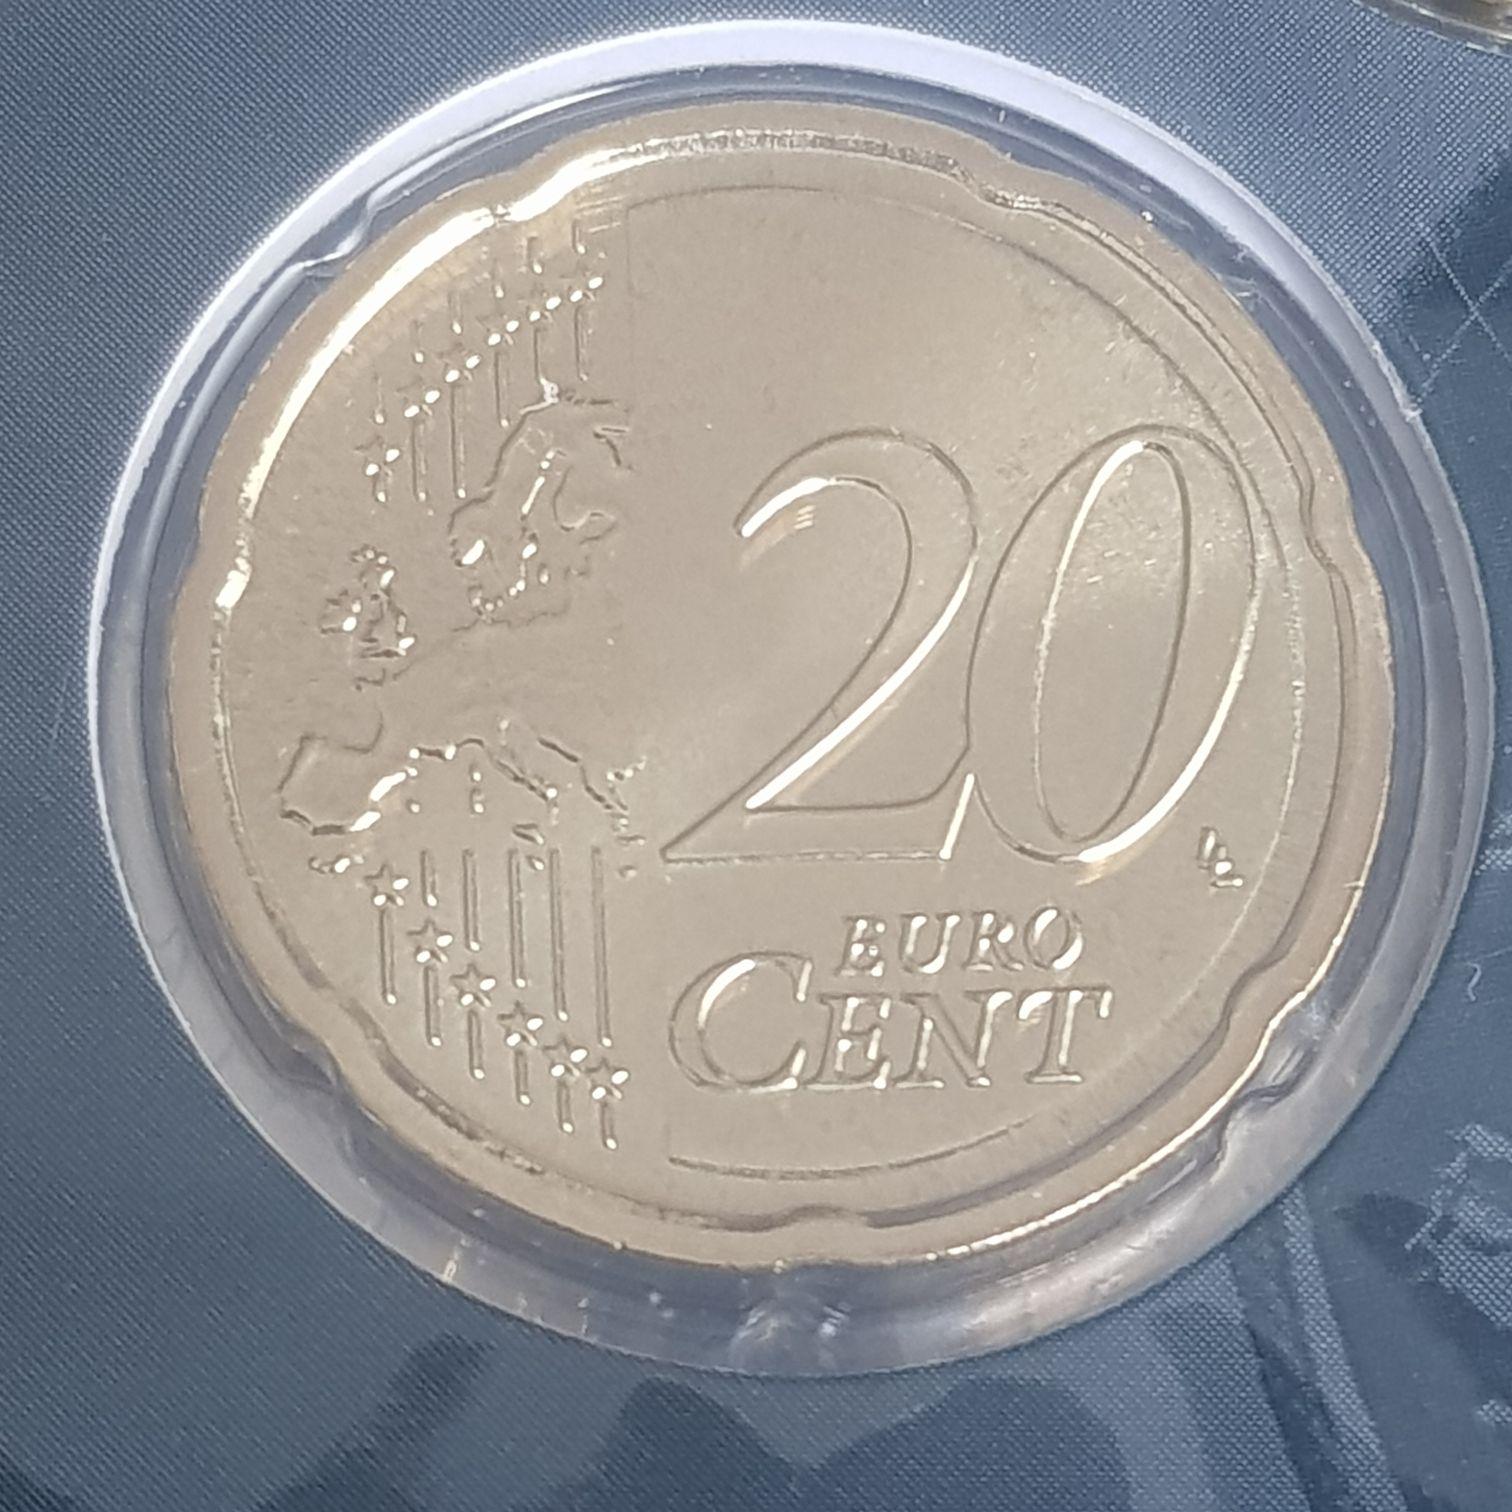 .2 Centavos De Euro Coin - $.20 (2017) front image (front cover)